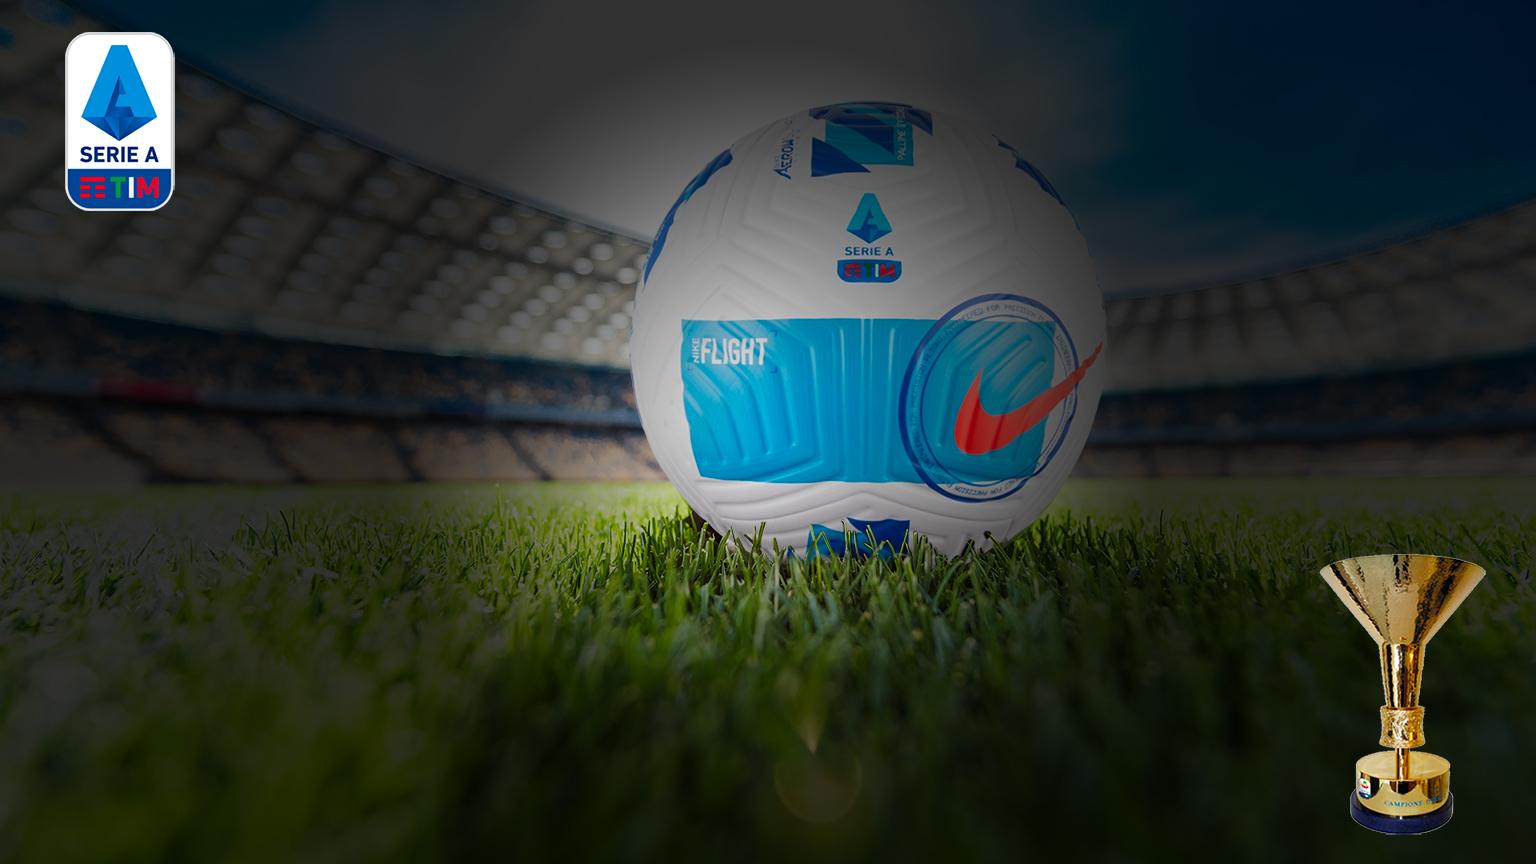 Peluang menang Serie A 2022 2021 scudetto juve inter napoli taruhan atalanta milan roma